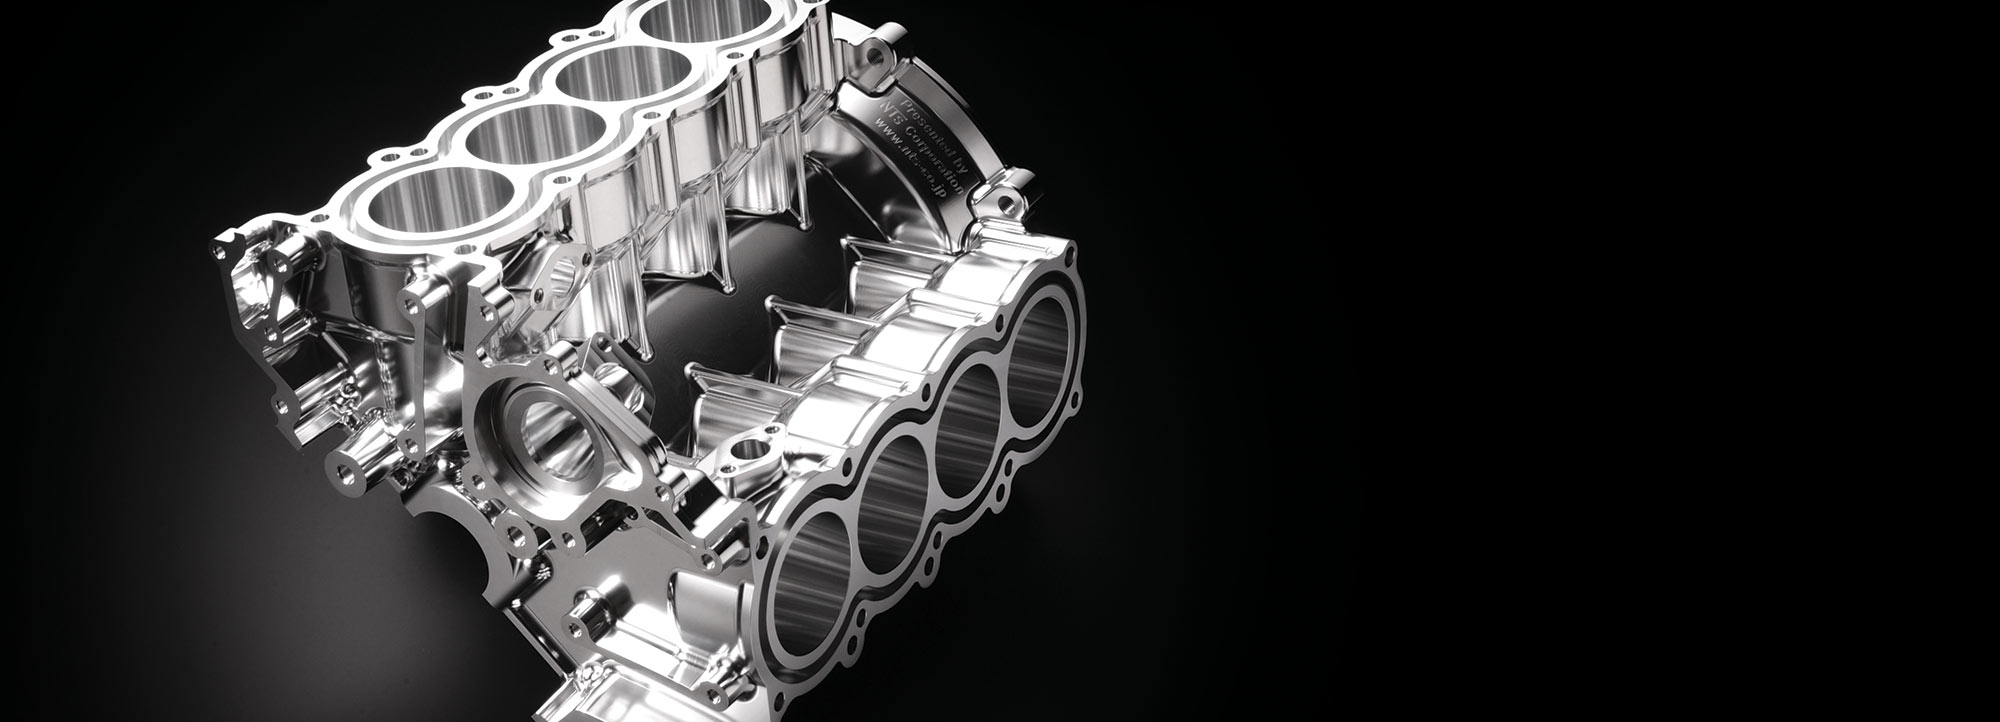 engineblock-1_fullsize.jpg